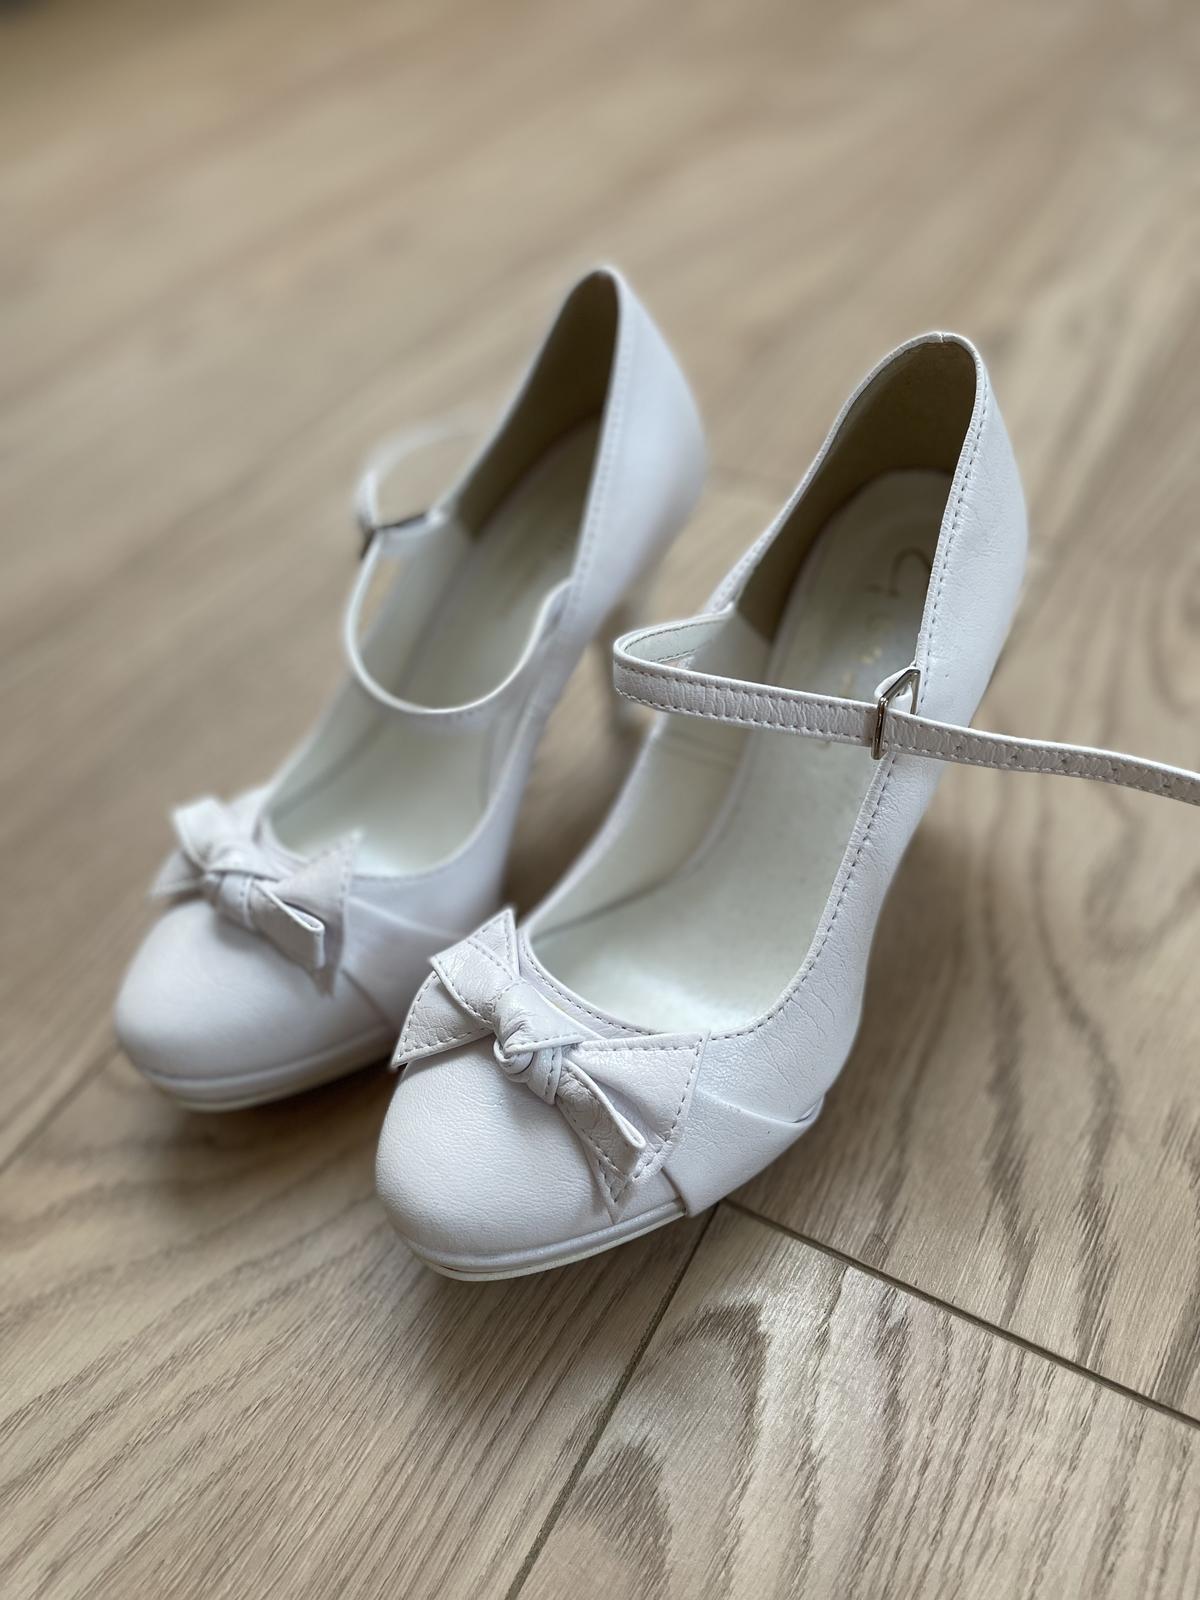 Svadobné topánky veľ. 35 - Obrázok č. 1